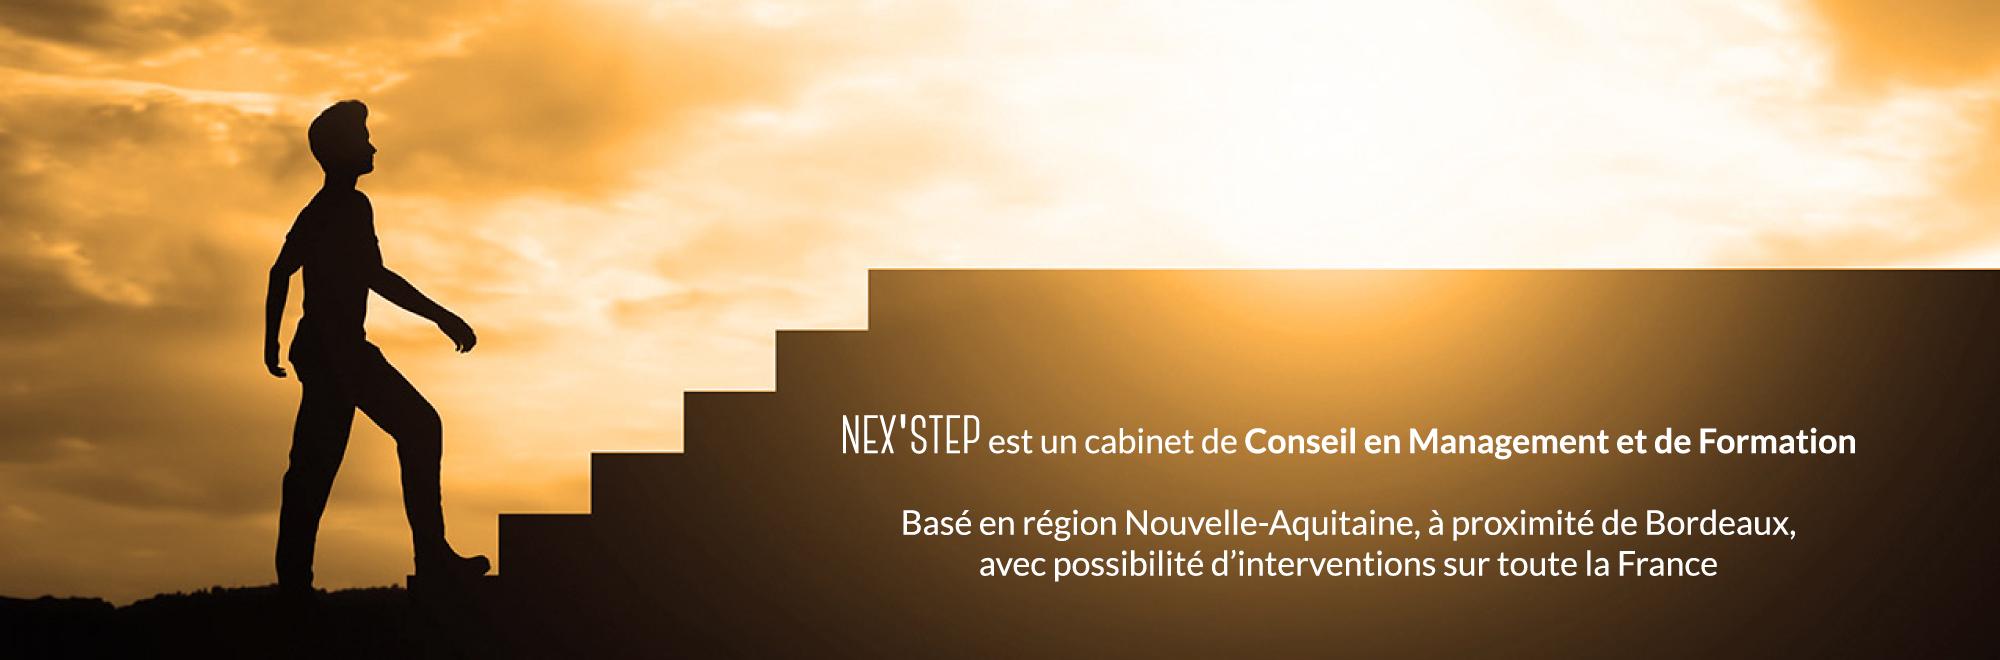 Stéphane Ménez - NexStep - Cabinet Management - Formation - Cabinet Management en entreprise et Formation - Management Bordeaux - Formation Bordeaux